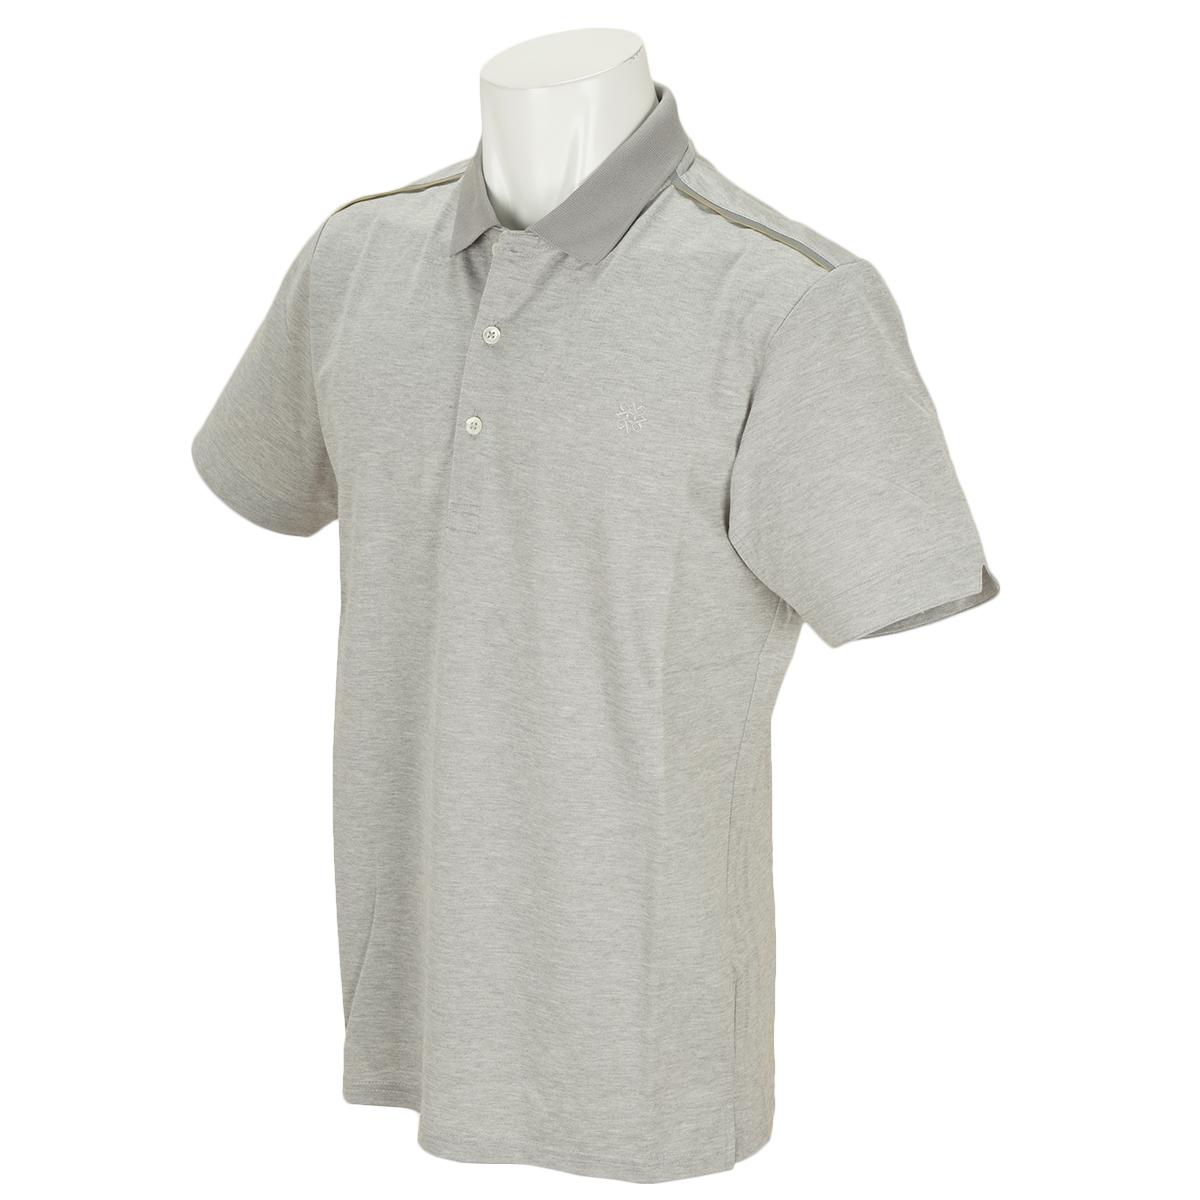 WhiteLabel COOLMAXハイゲージハニカム半袖ポロシャツ